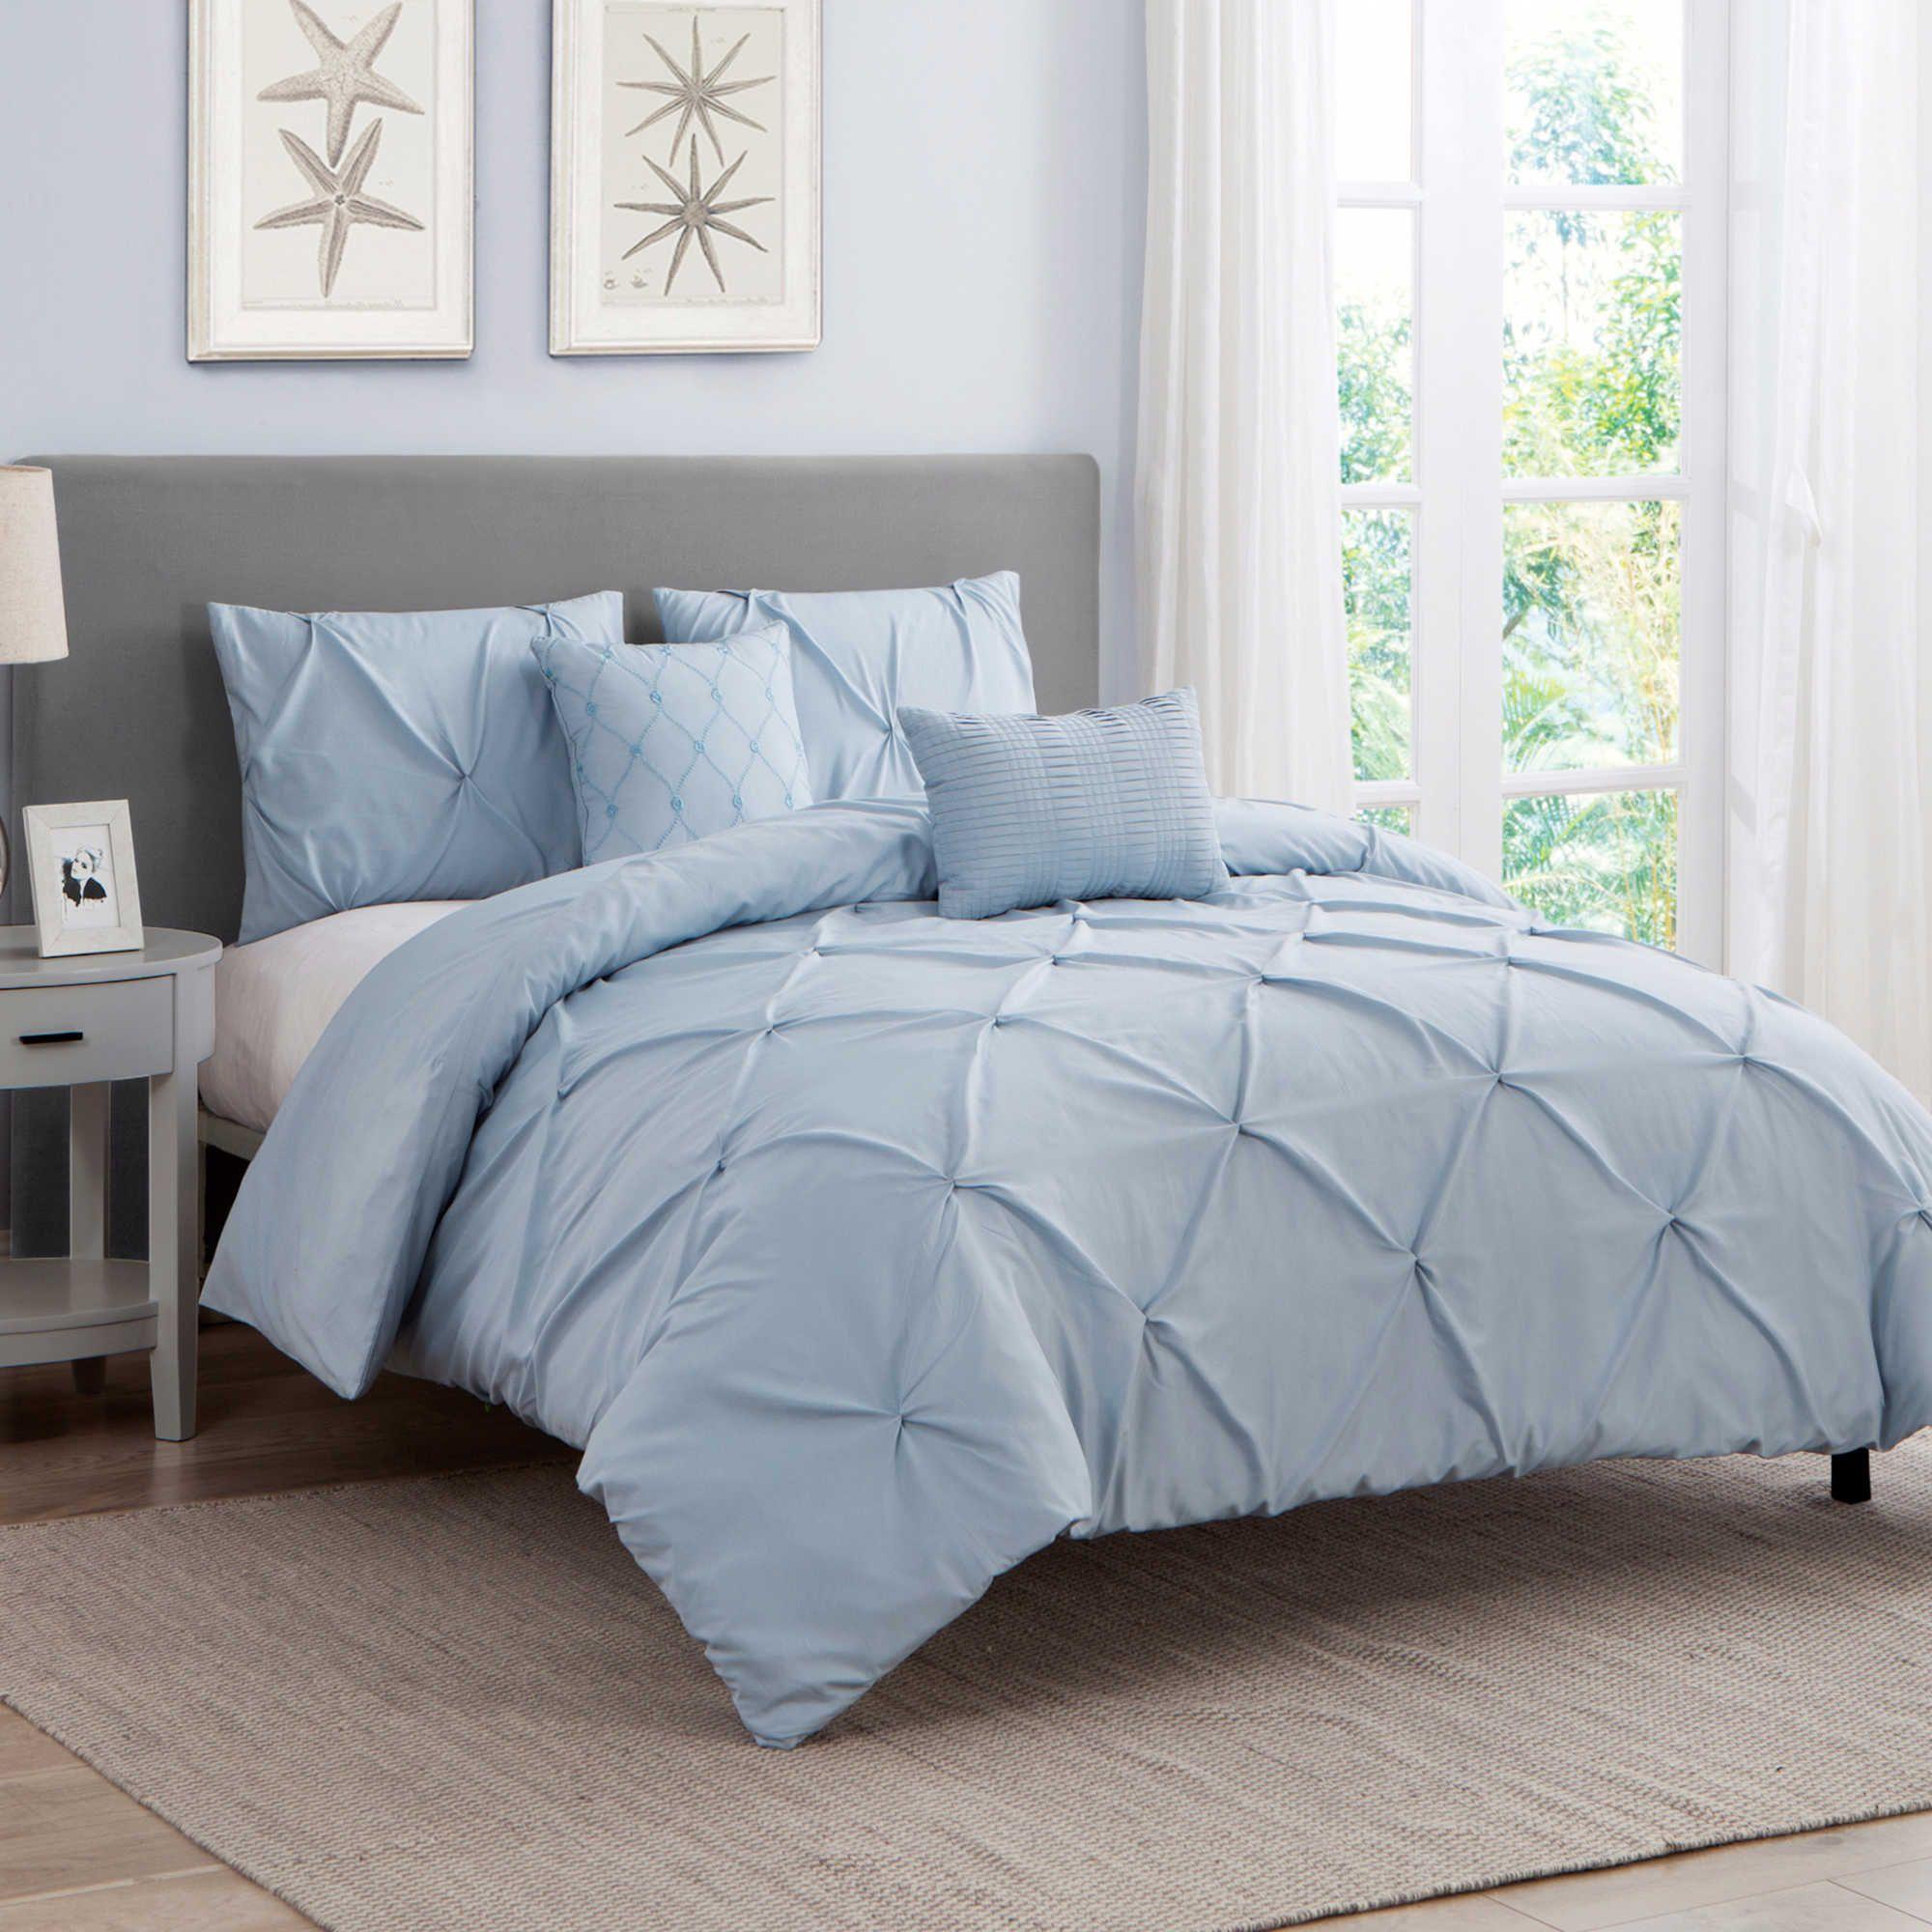 Ooo Mirtehservis Https Mirtech Com Ua Kassovye Apparaty Fiskalnye Registratory Printery Skanery Comforter Sets Light Blue Comforter Blue Comforter